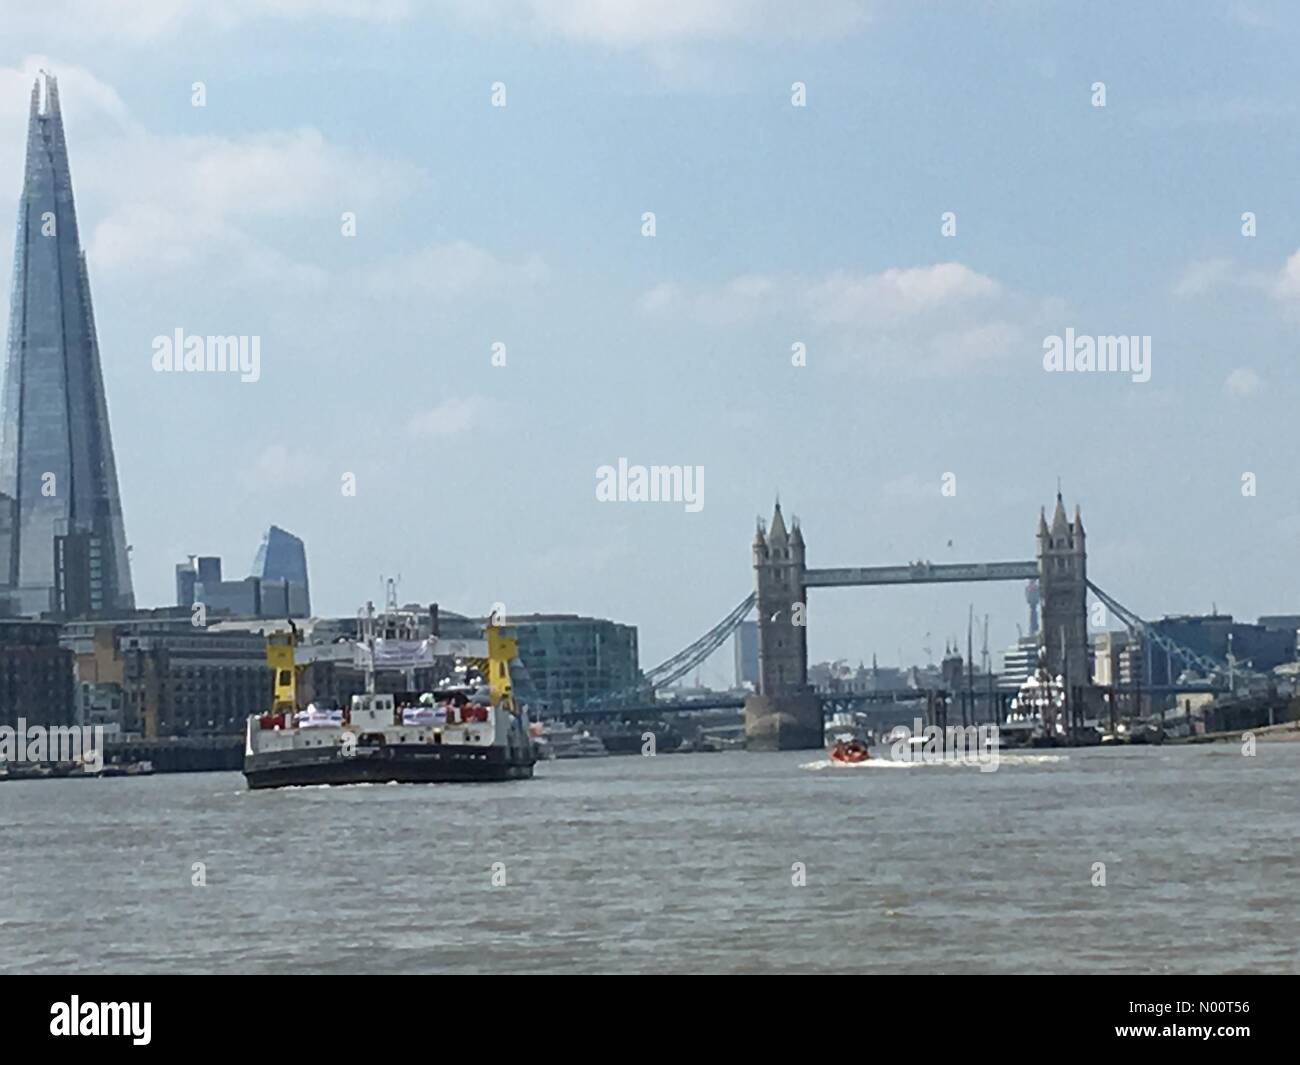 London, UK. 7th July 2018. Credit: Susannah Jayes/StockimoNews/Alamy Live News Stock Photo